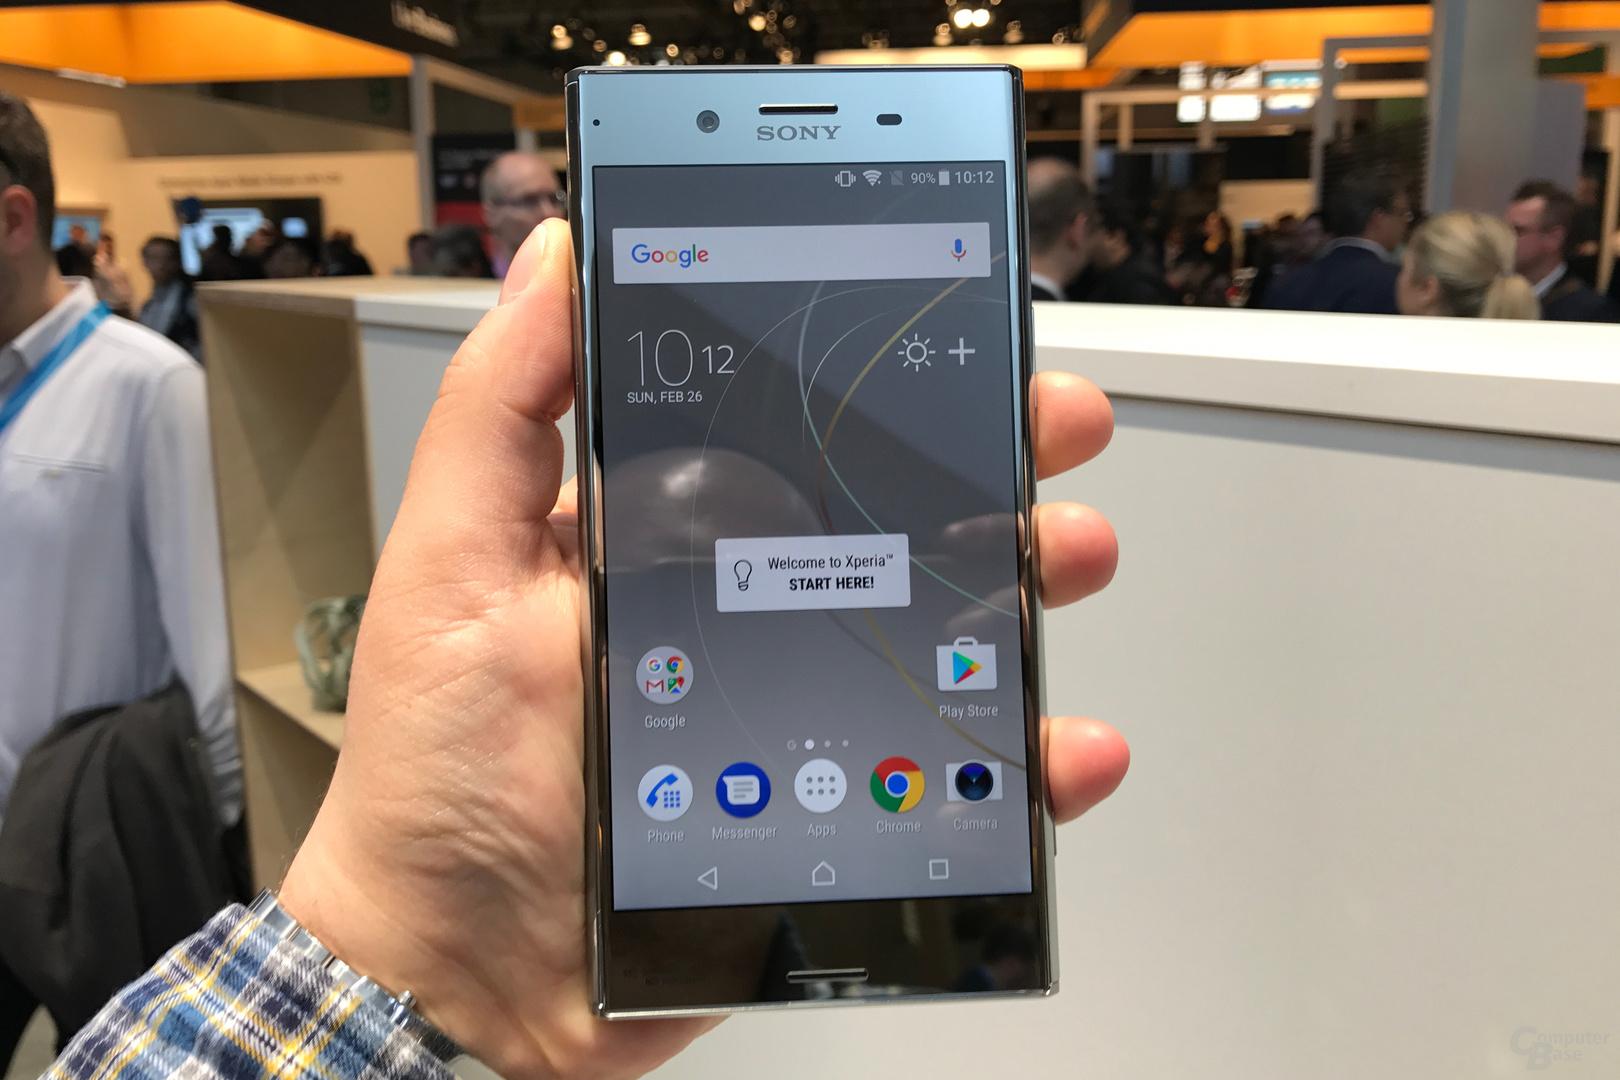 Sony Xperia XZ Premium läuft mit Android 7.1